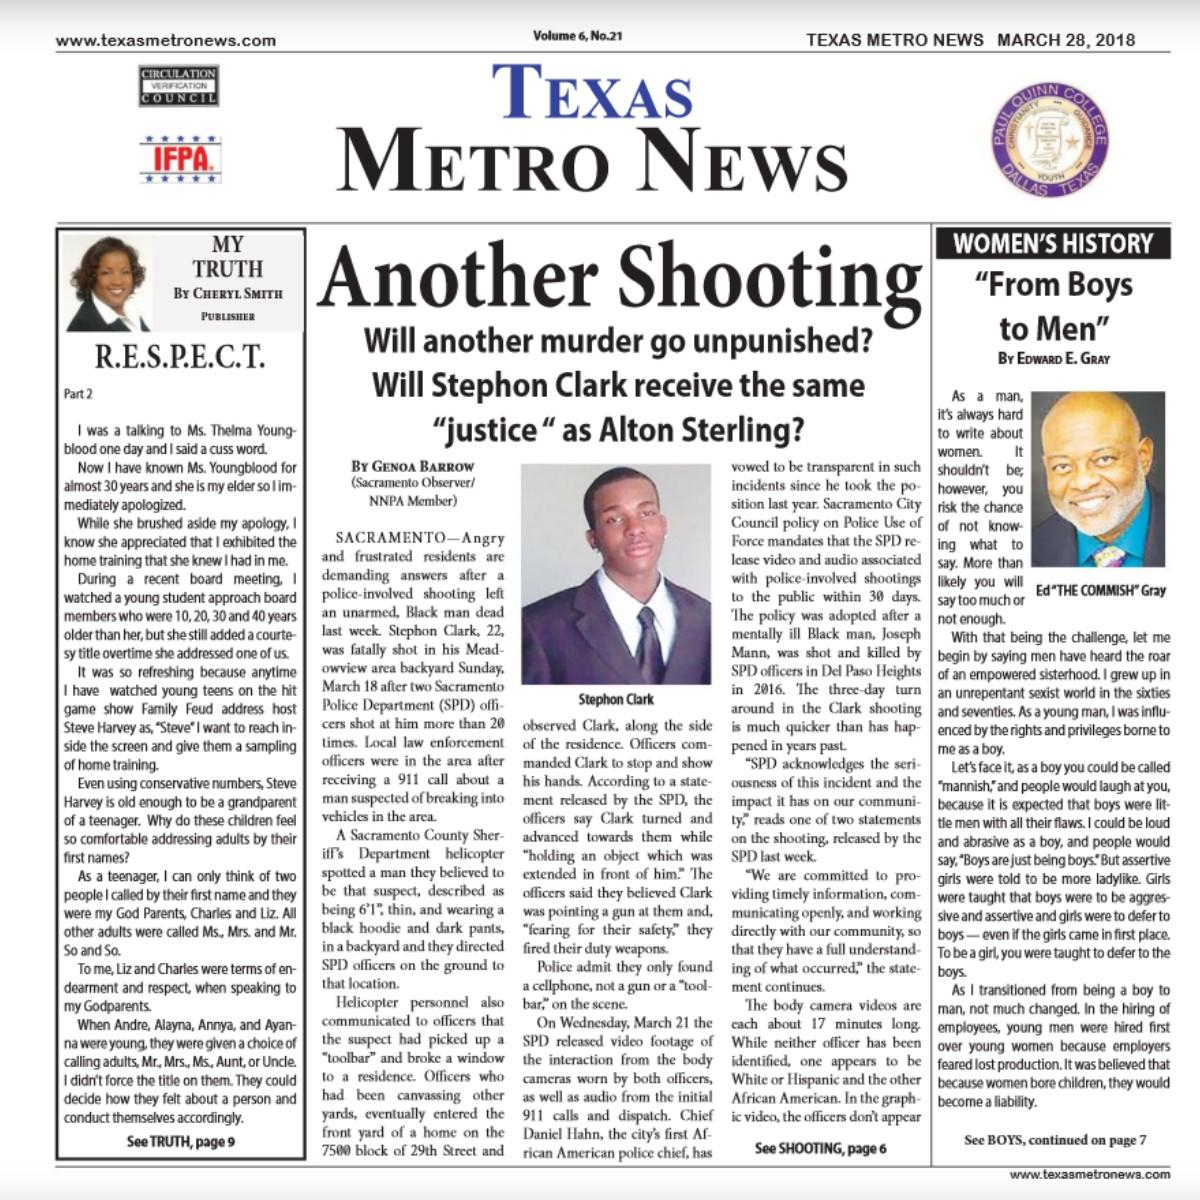 Texas Metro News: 3/28/18